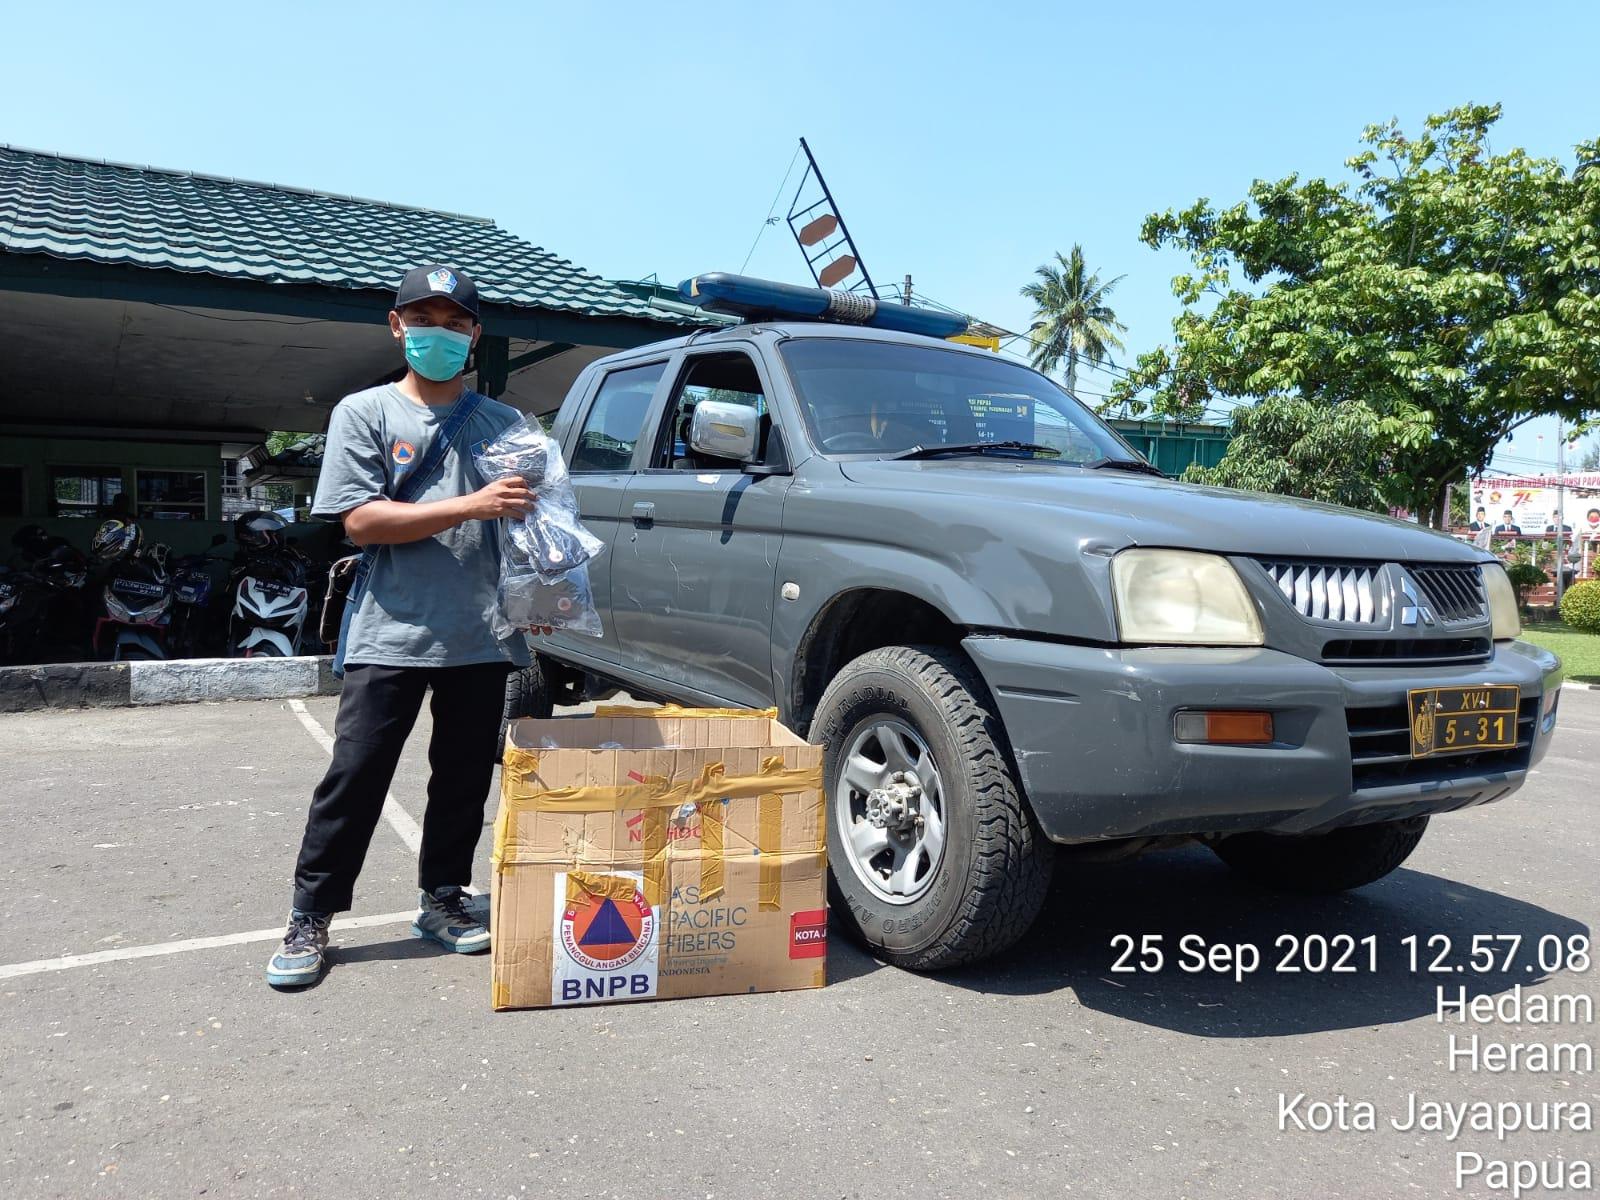 https: img.okezone.com content 2021 09 25 337 2476741 mobil-masker-strategi-bnpb-untuk-perkuat-prokes-di-gelaran-pon-xx-papua-19jprHomc0.jpg